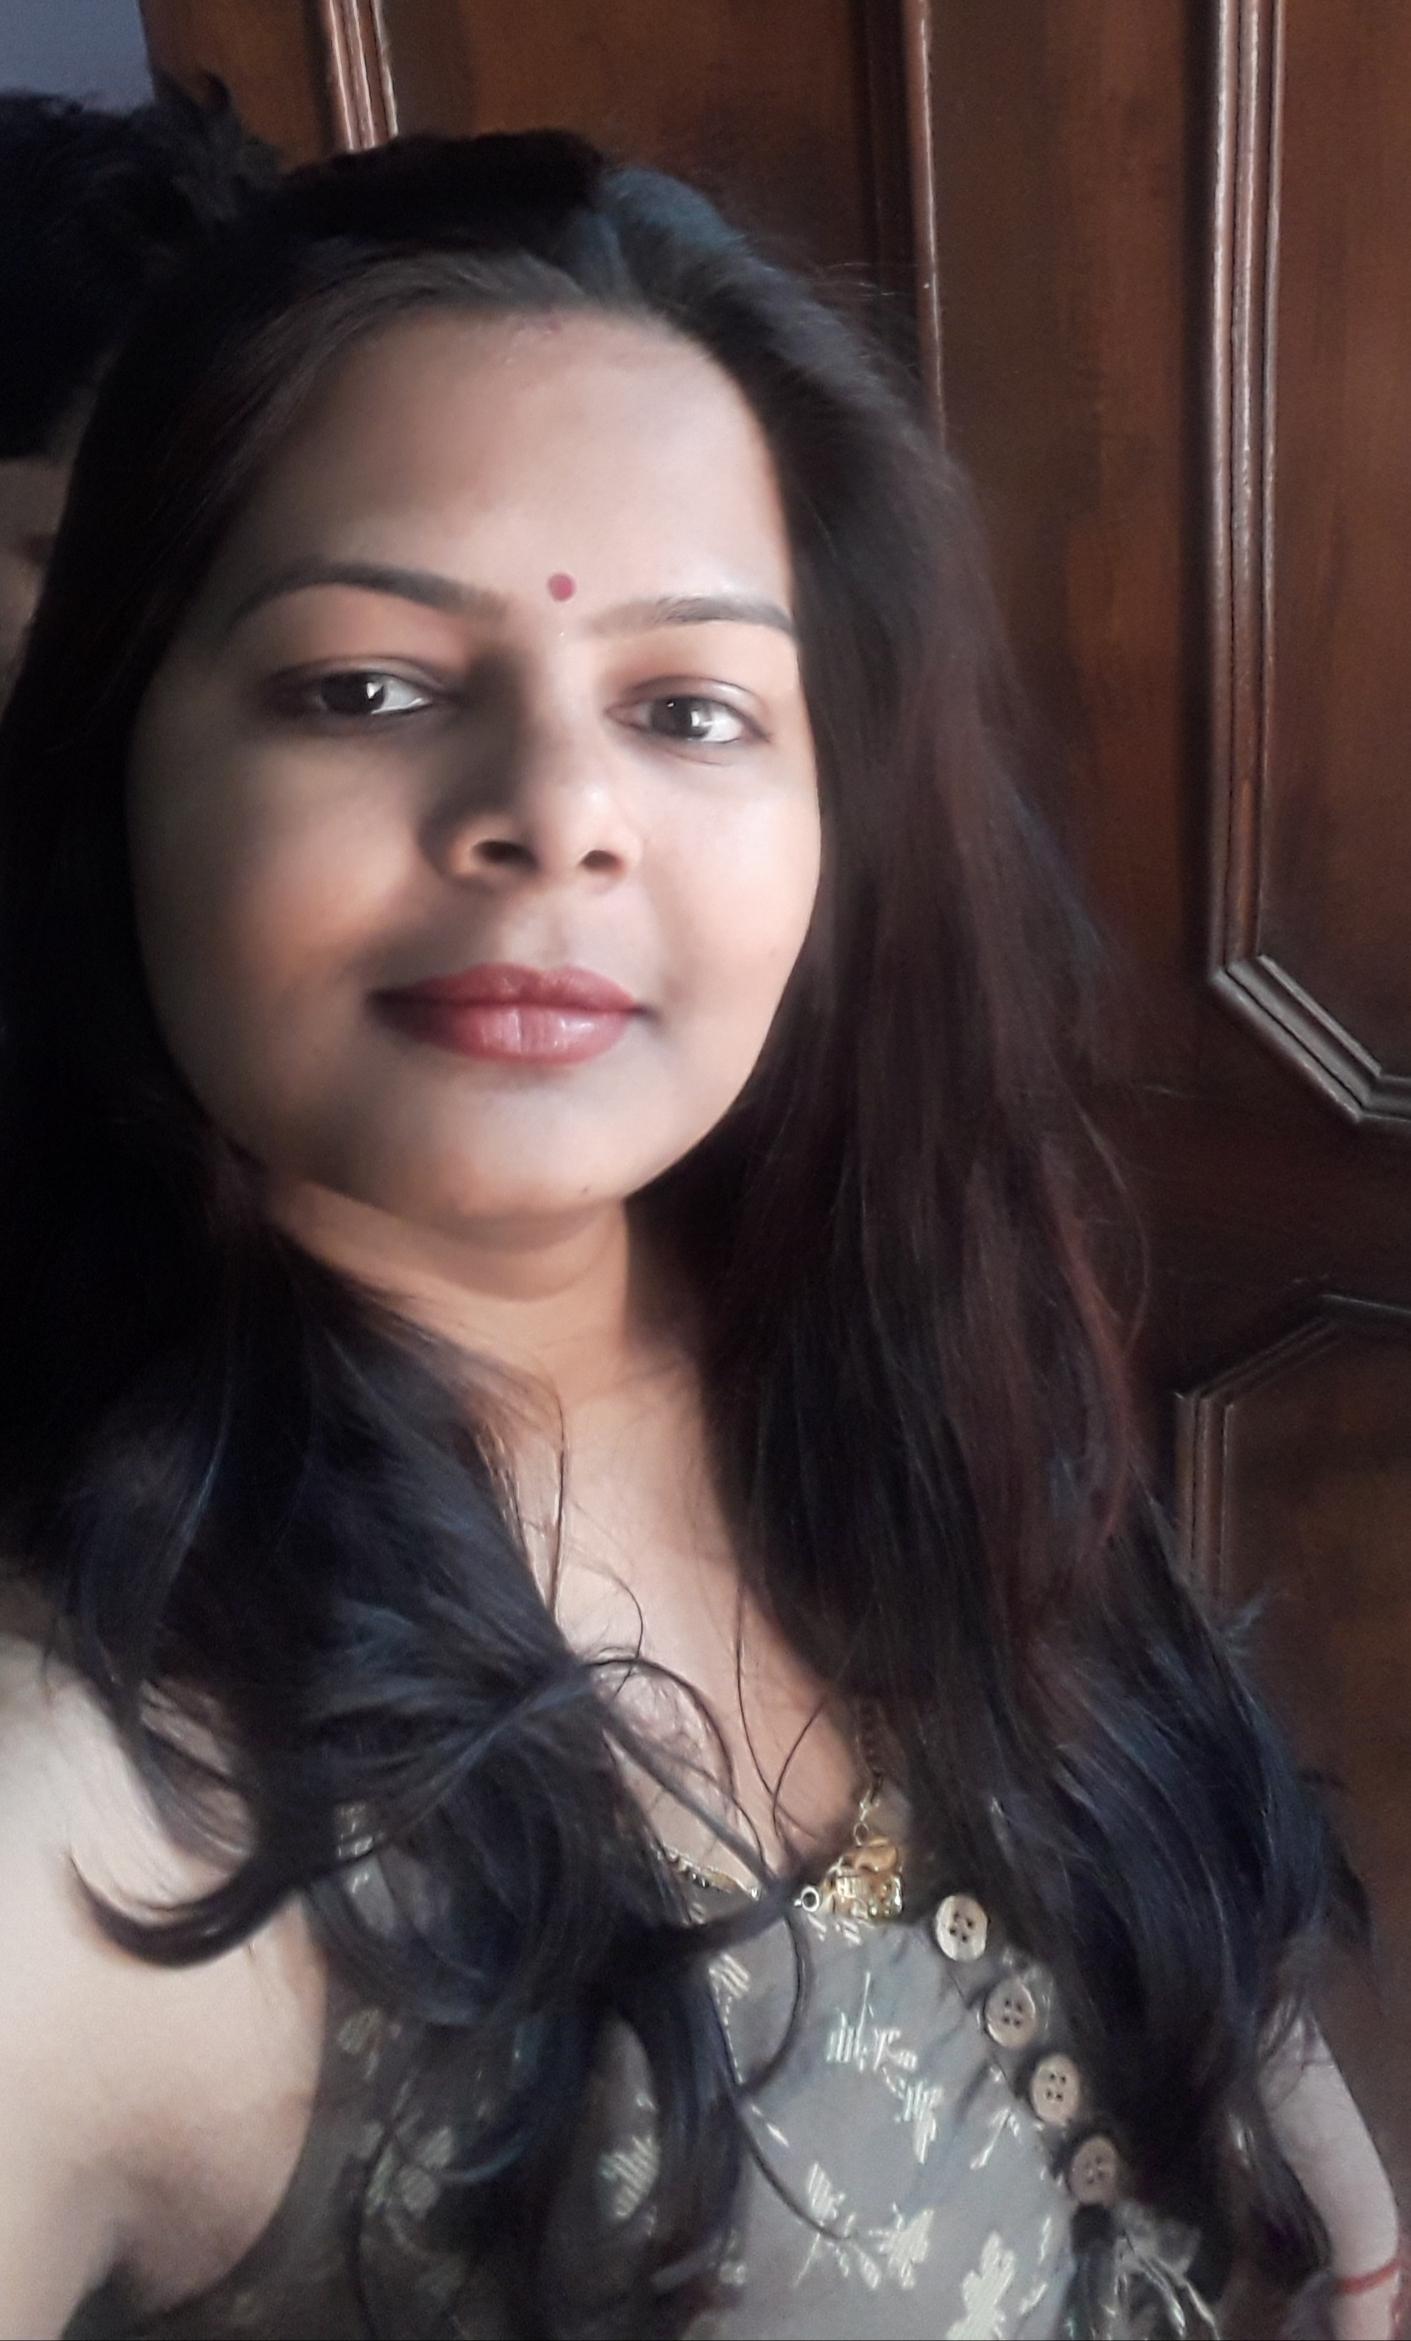 Fogg Paradise Body Spray For Women-One of the best women body spray-By nayra